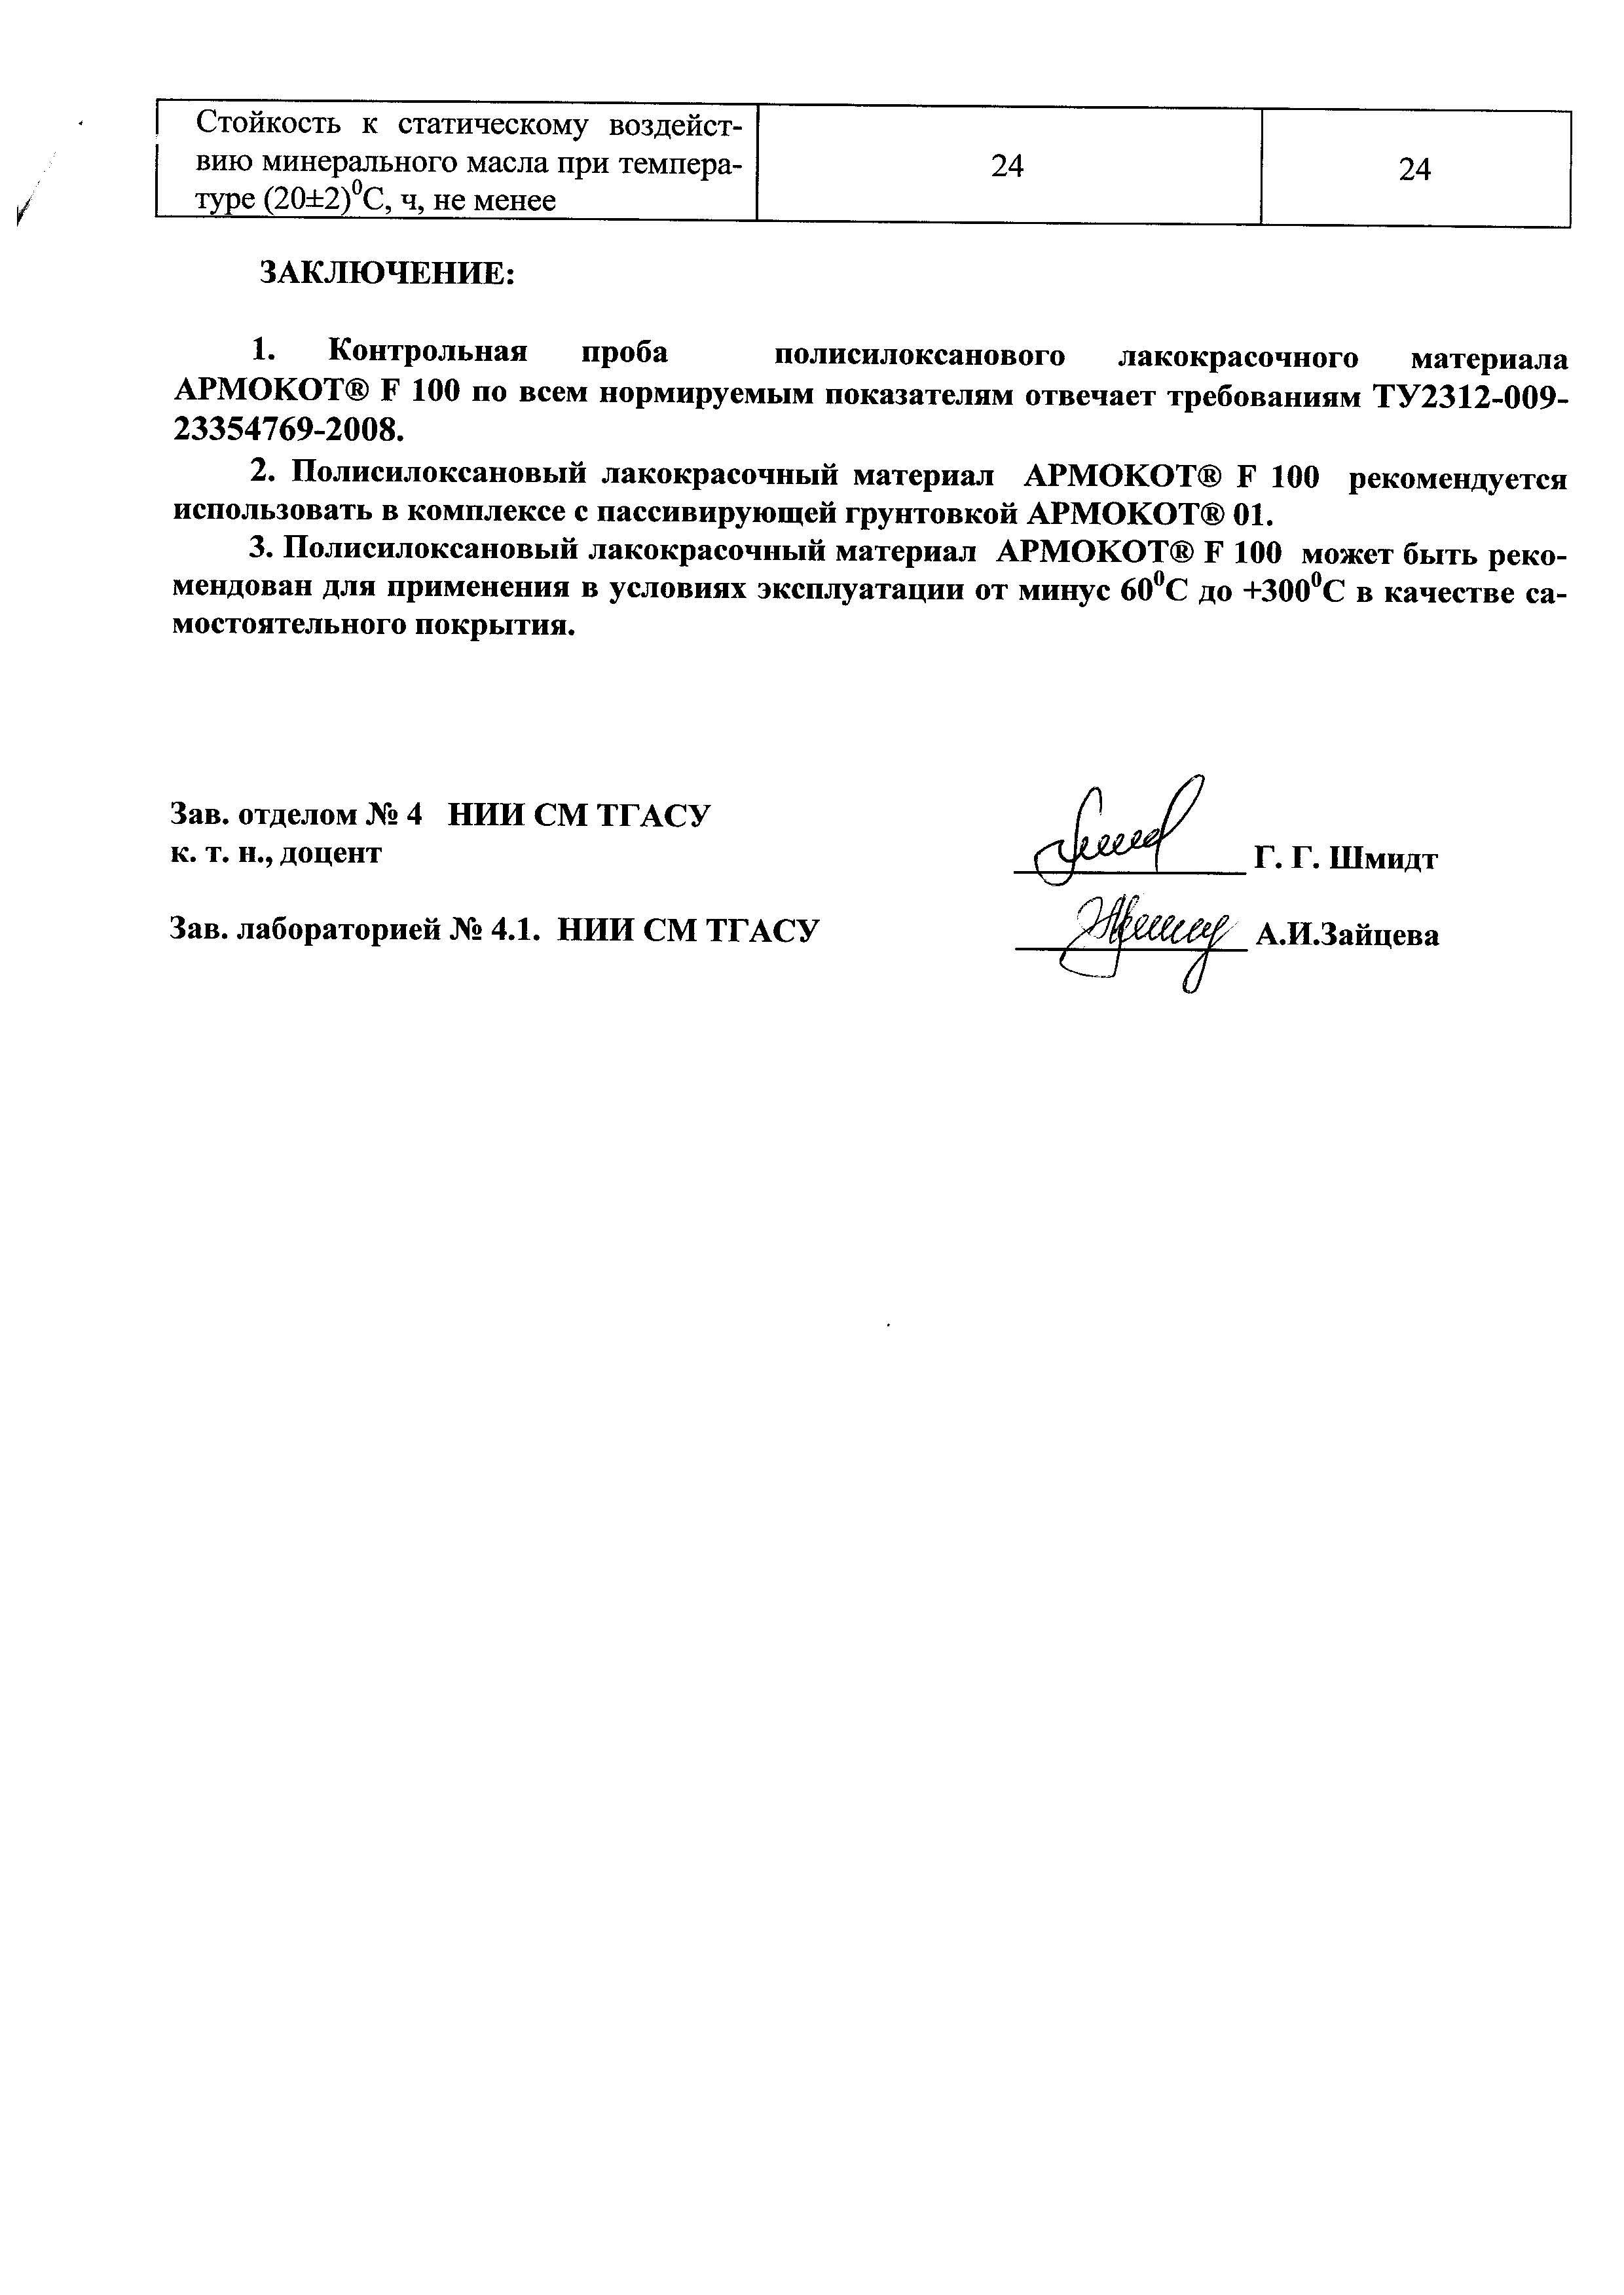 Протокол_АРМОКОТ F100_Страница_2